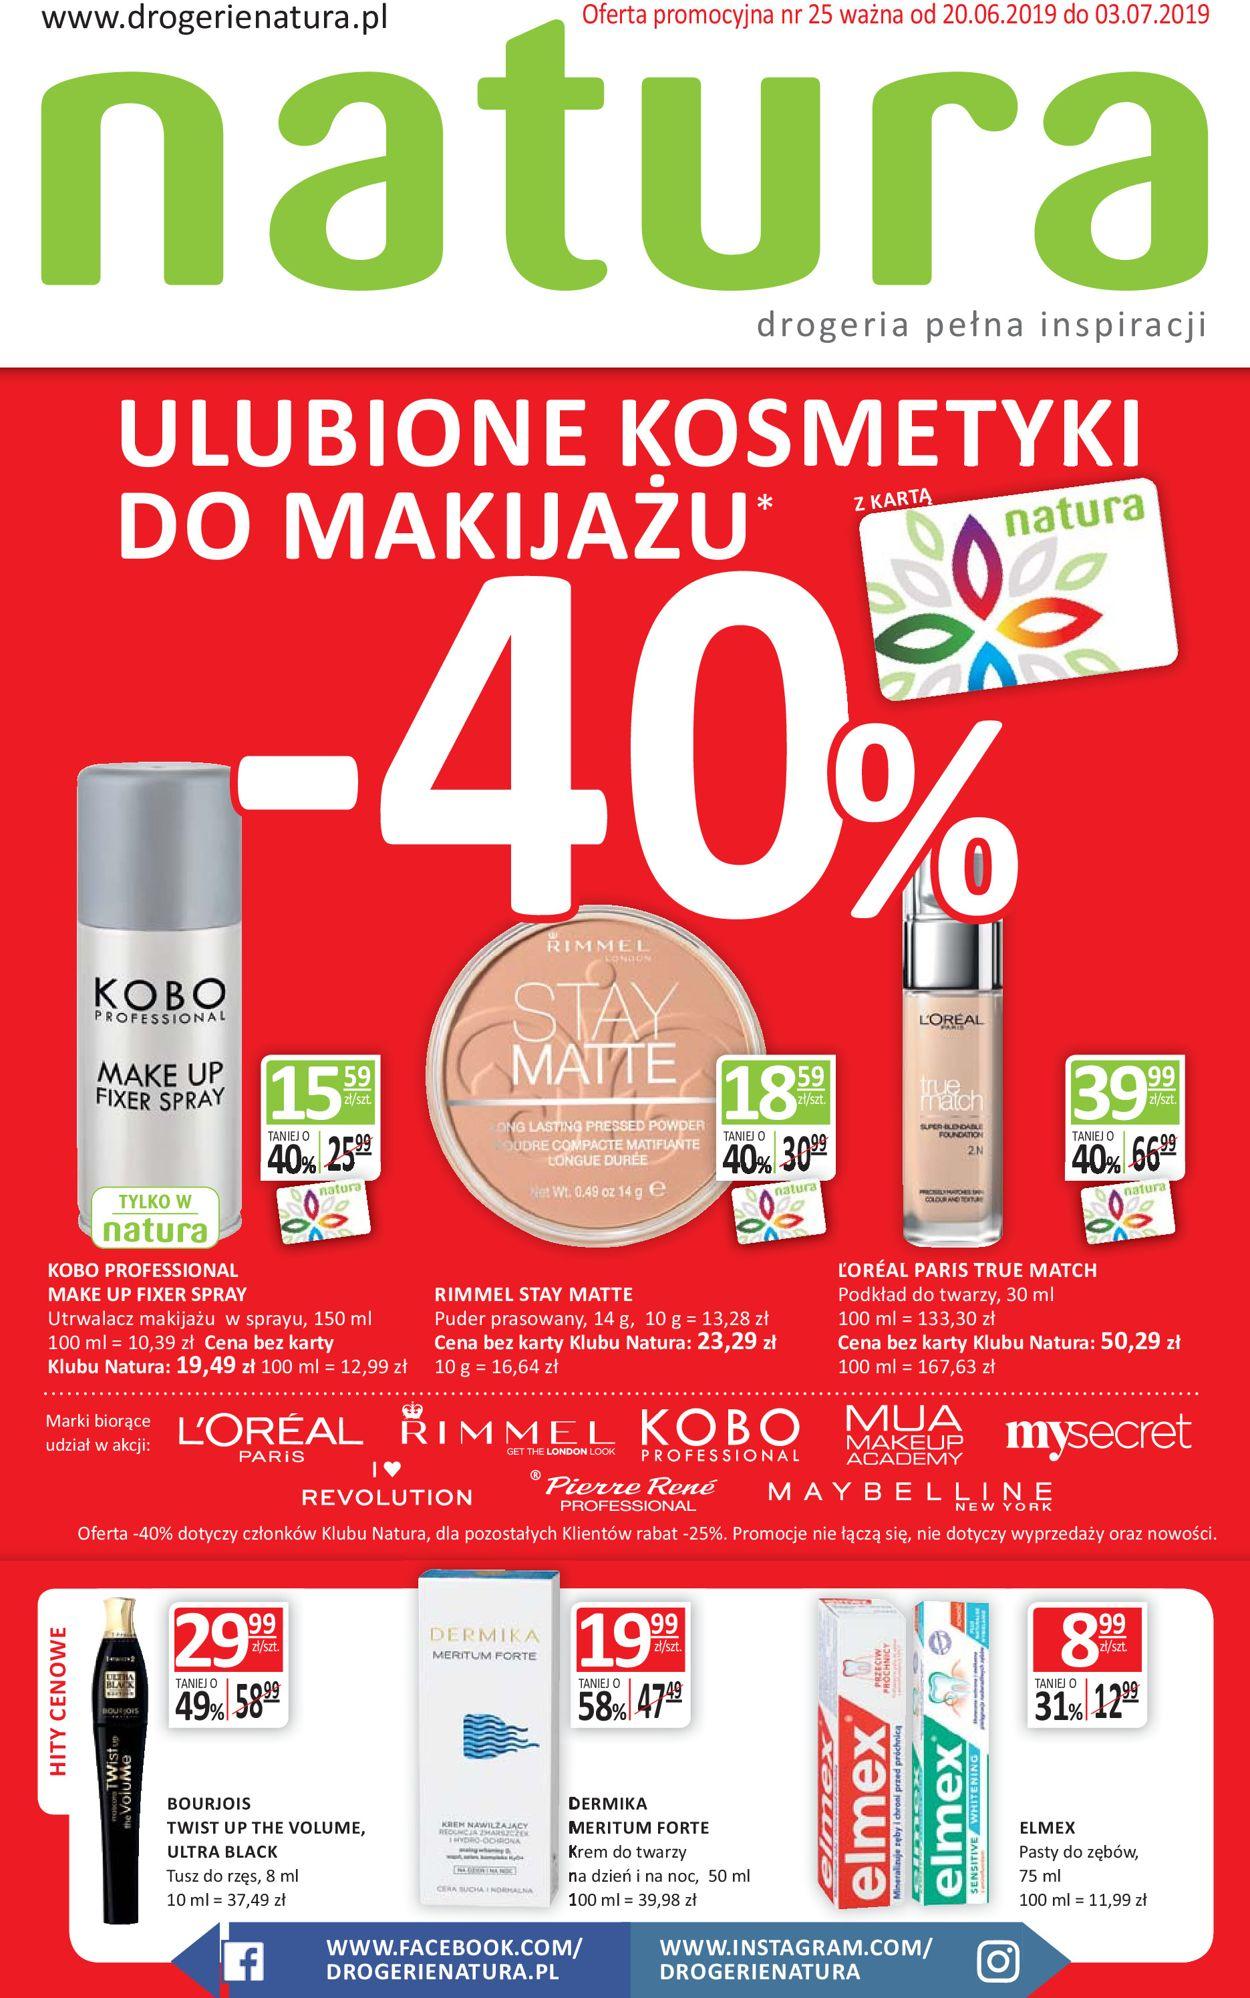 Gazetka promocyjna Natura - 20.06-03.07.2019